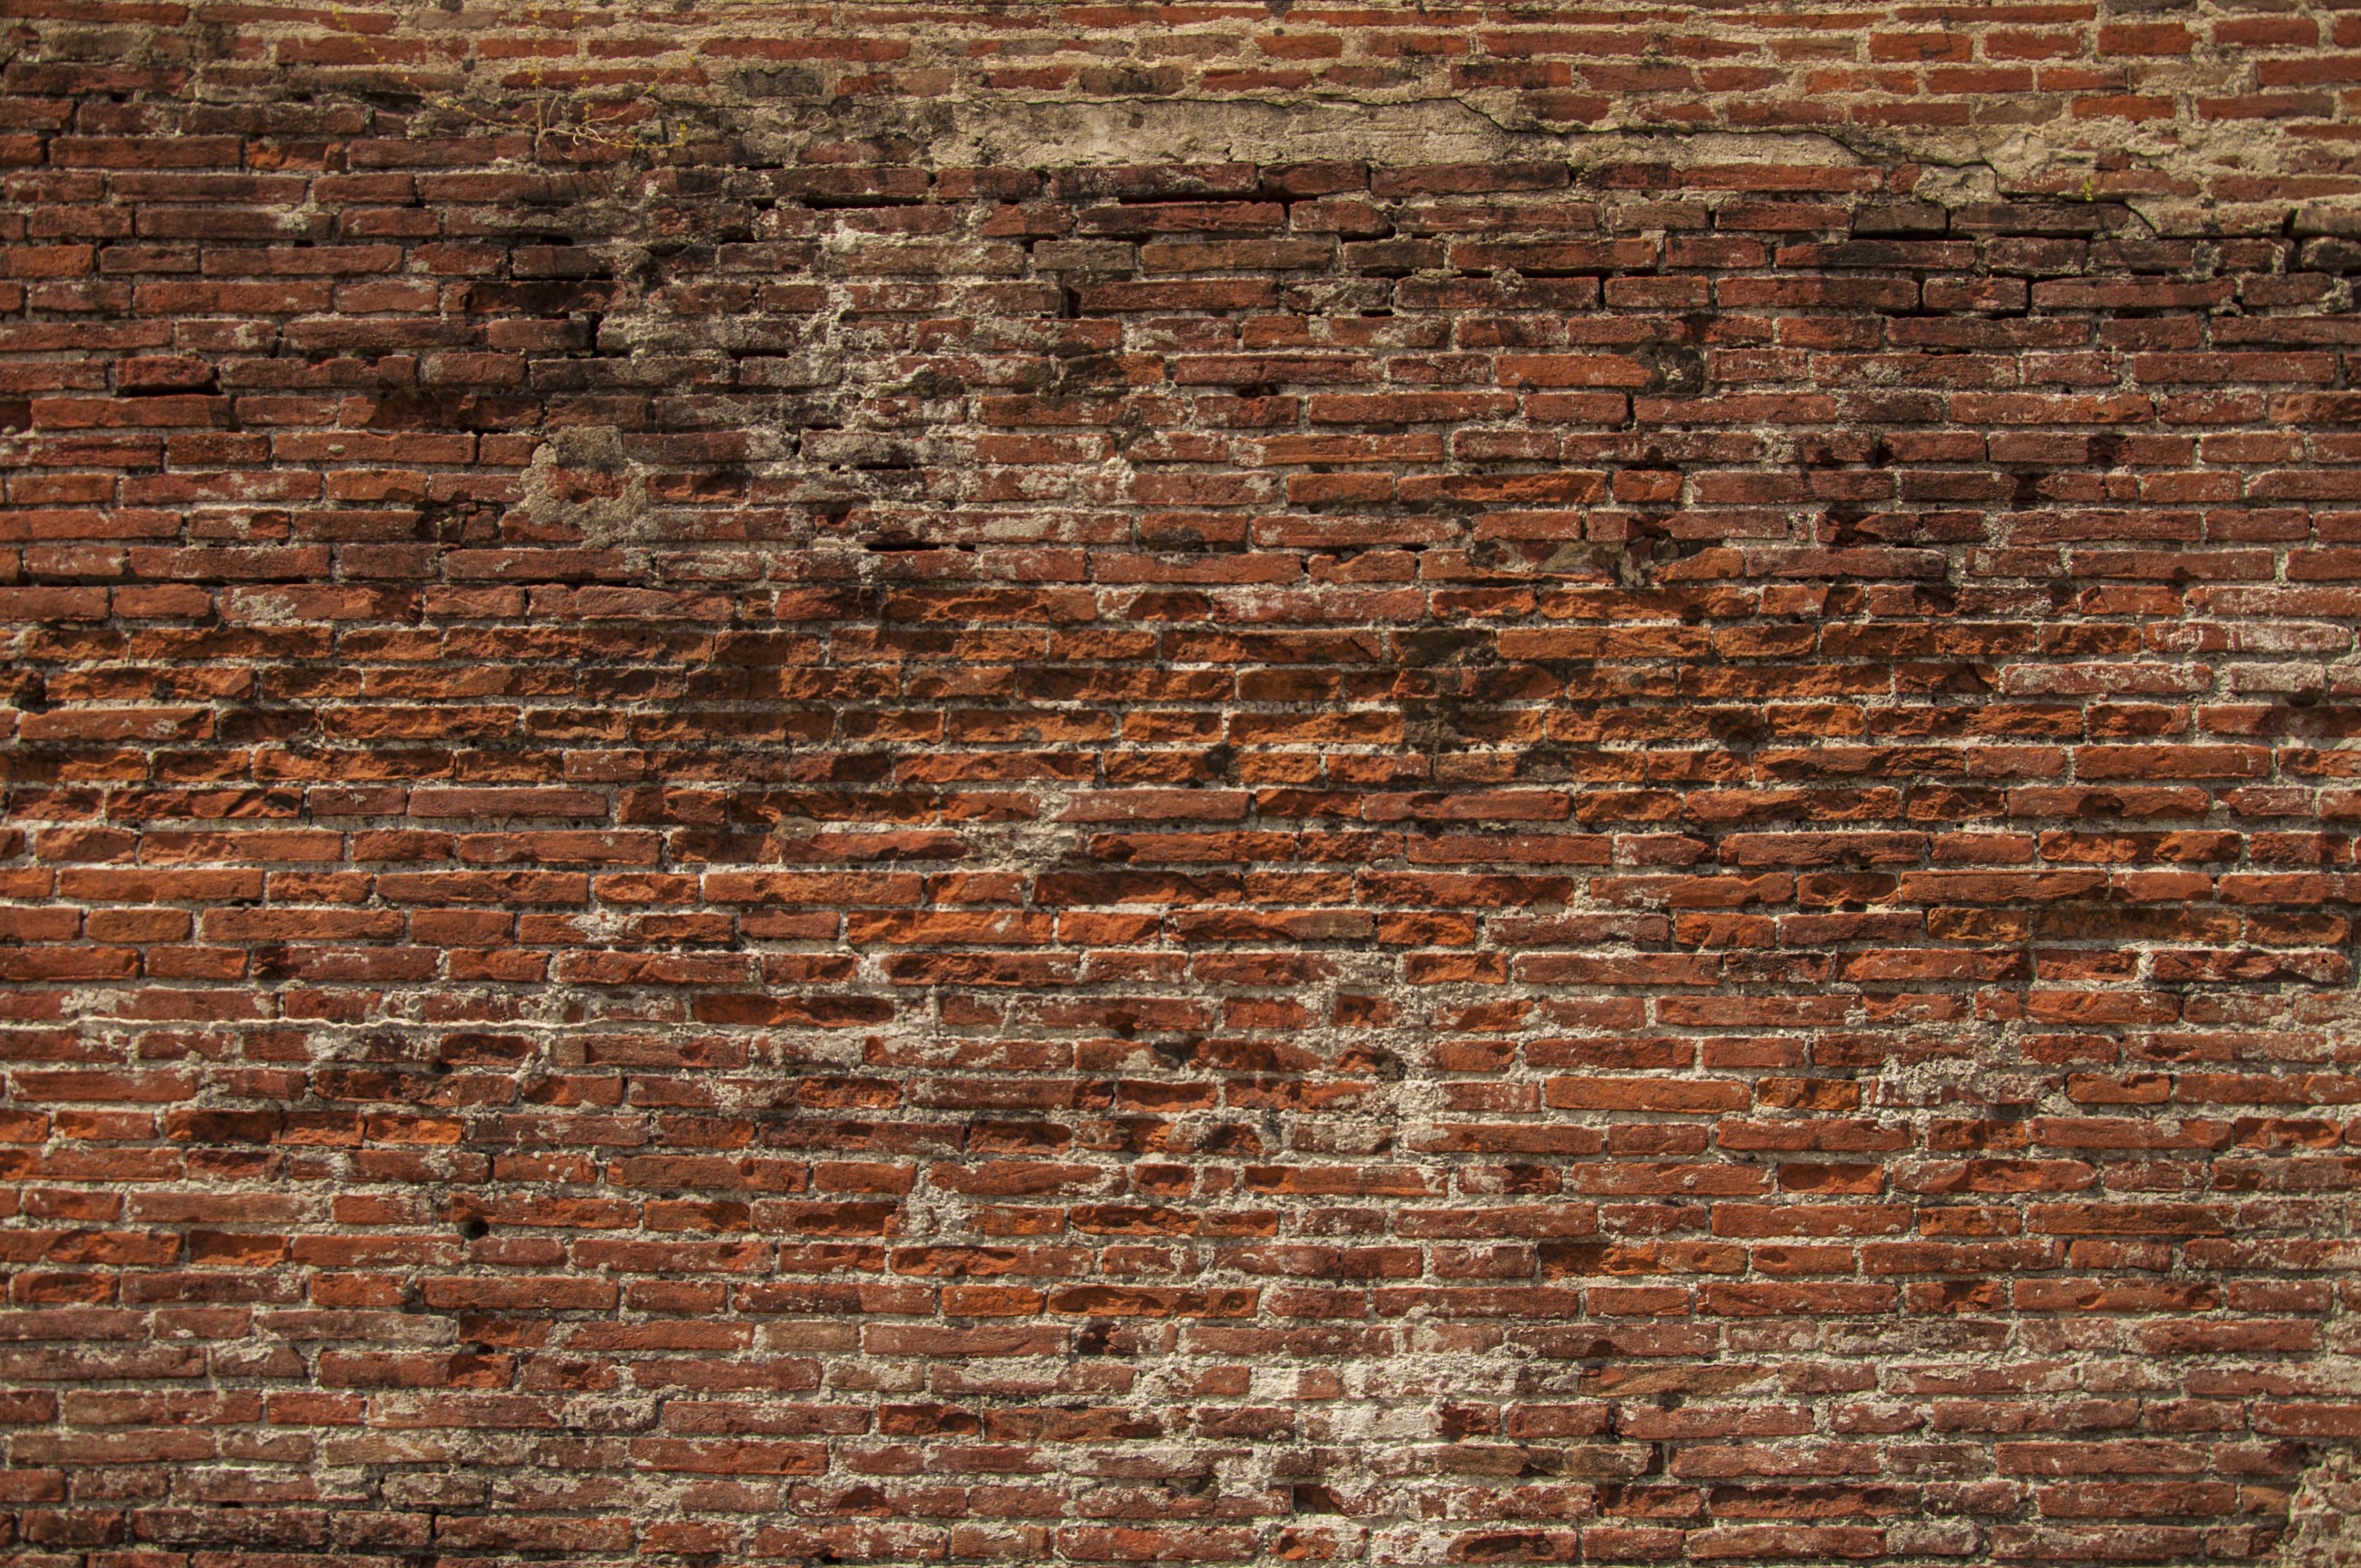 Каменная кладка: технология, виды, текстура